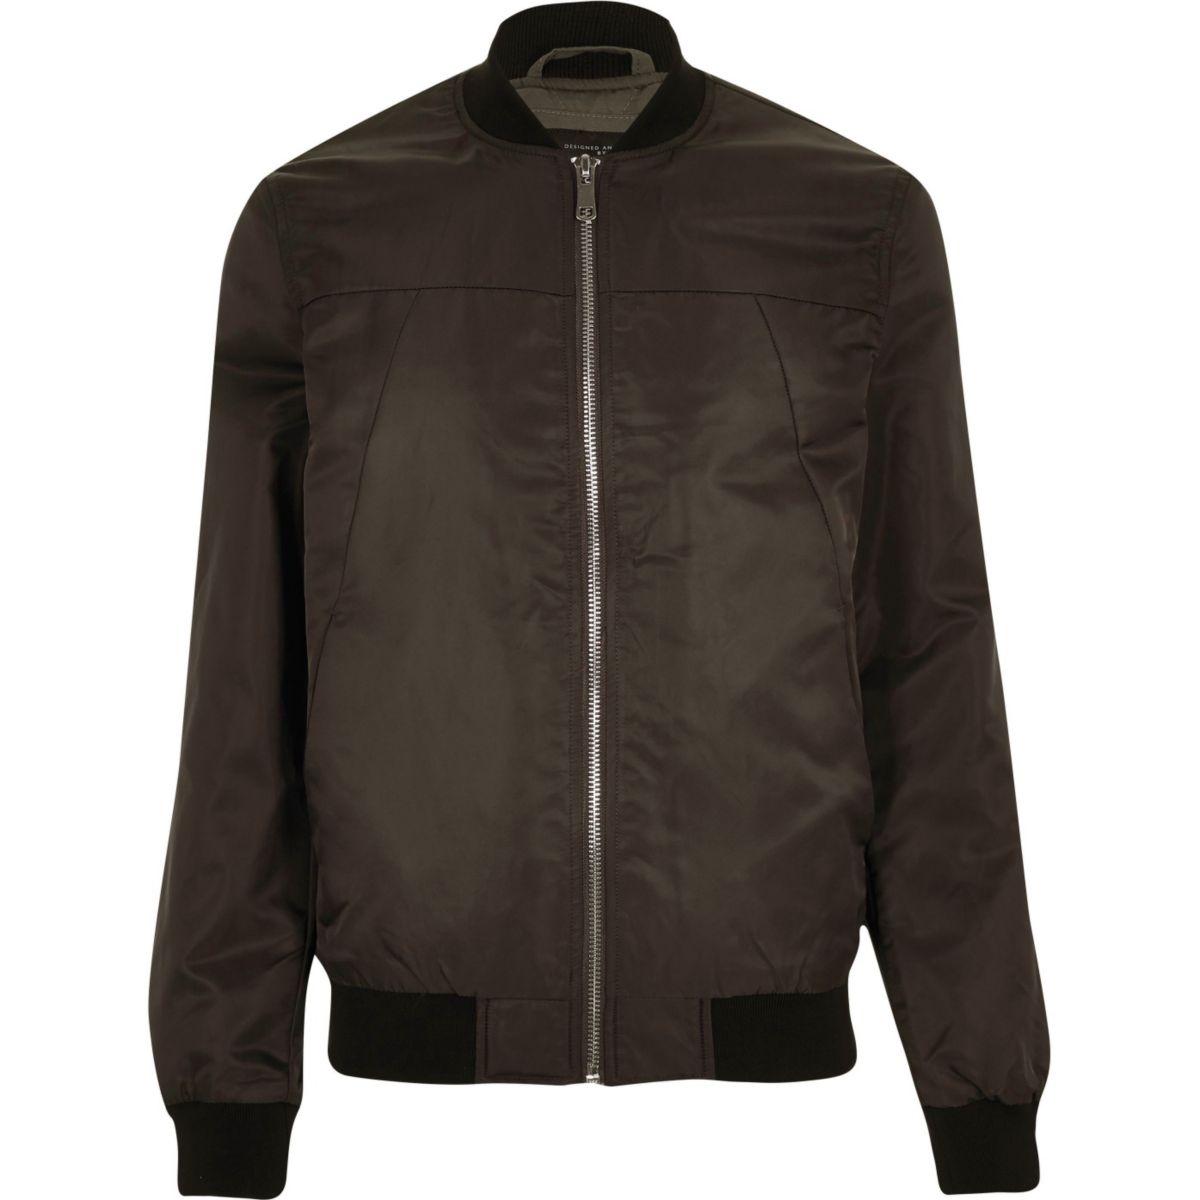 Dark brown casual bomber jacket